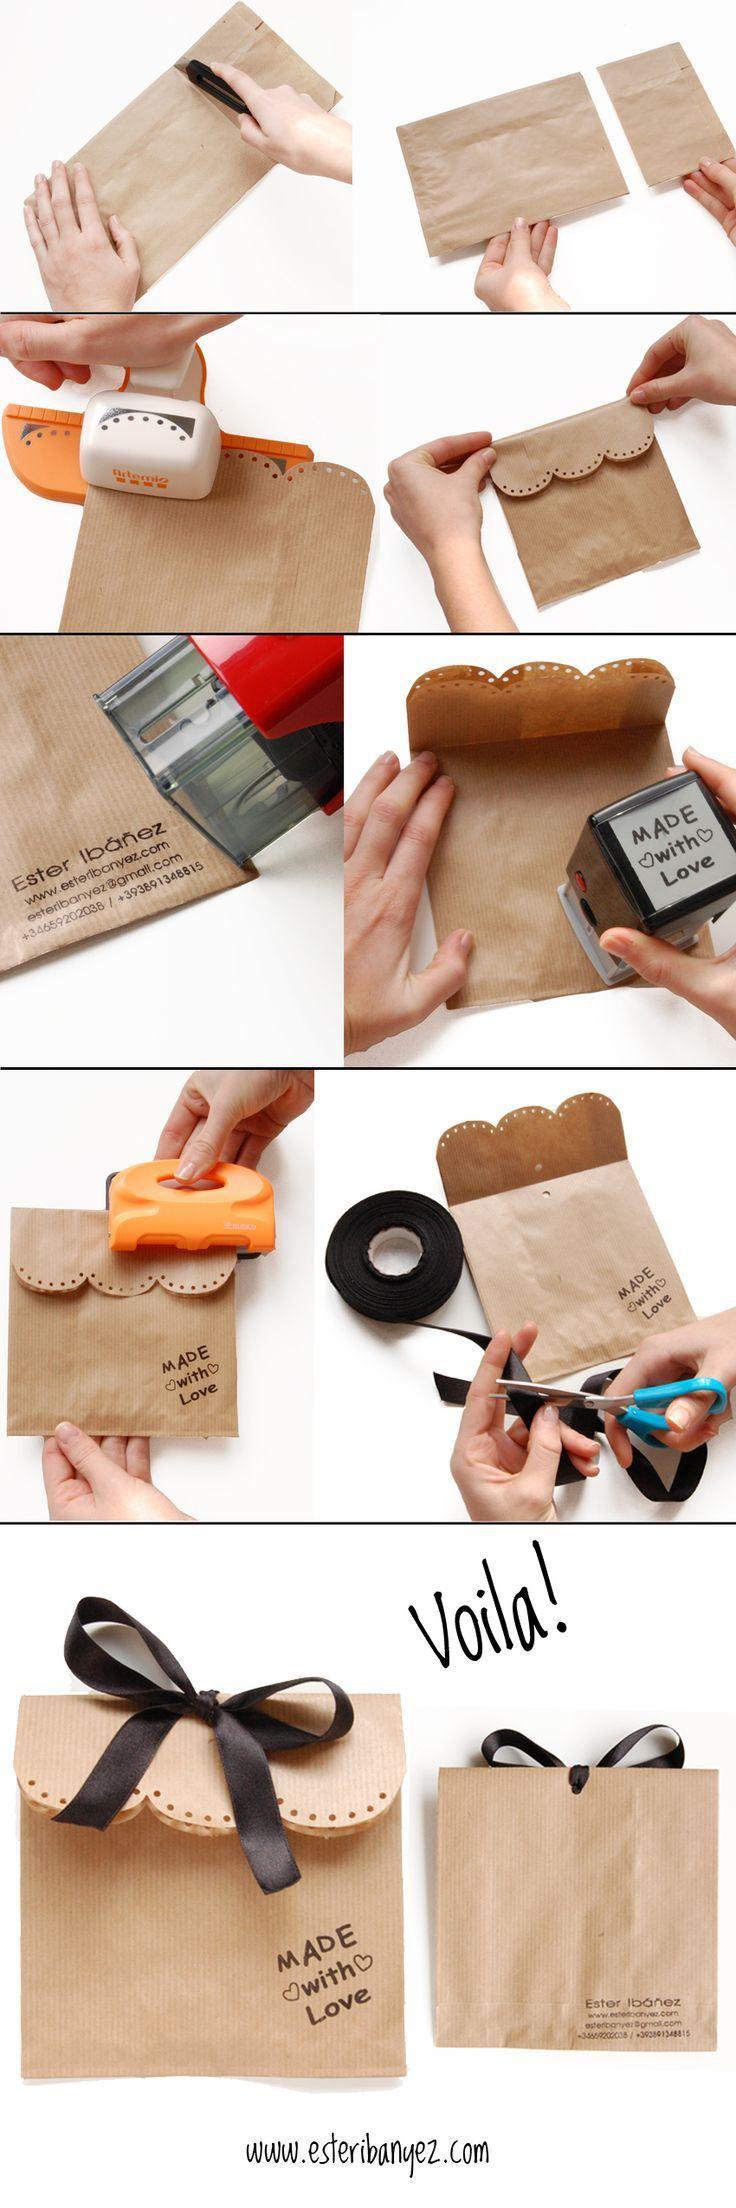 Inspiration Noël #3 : Paquet Made In Maison … i love it ! | Iness Kraft